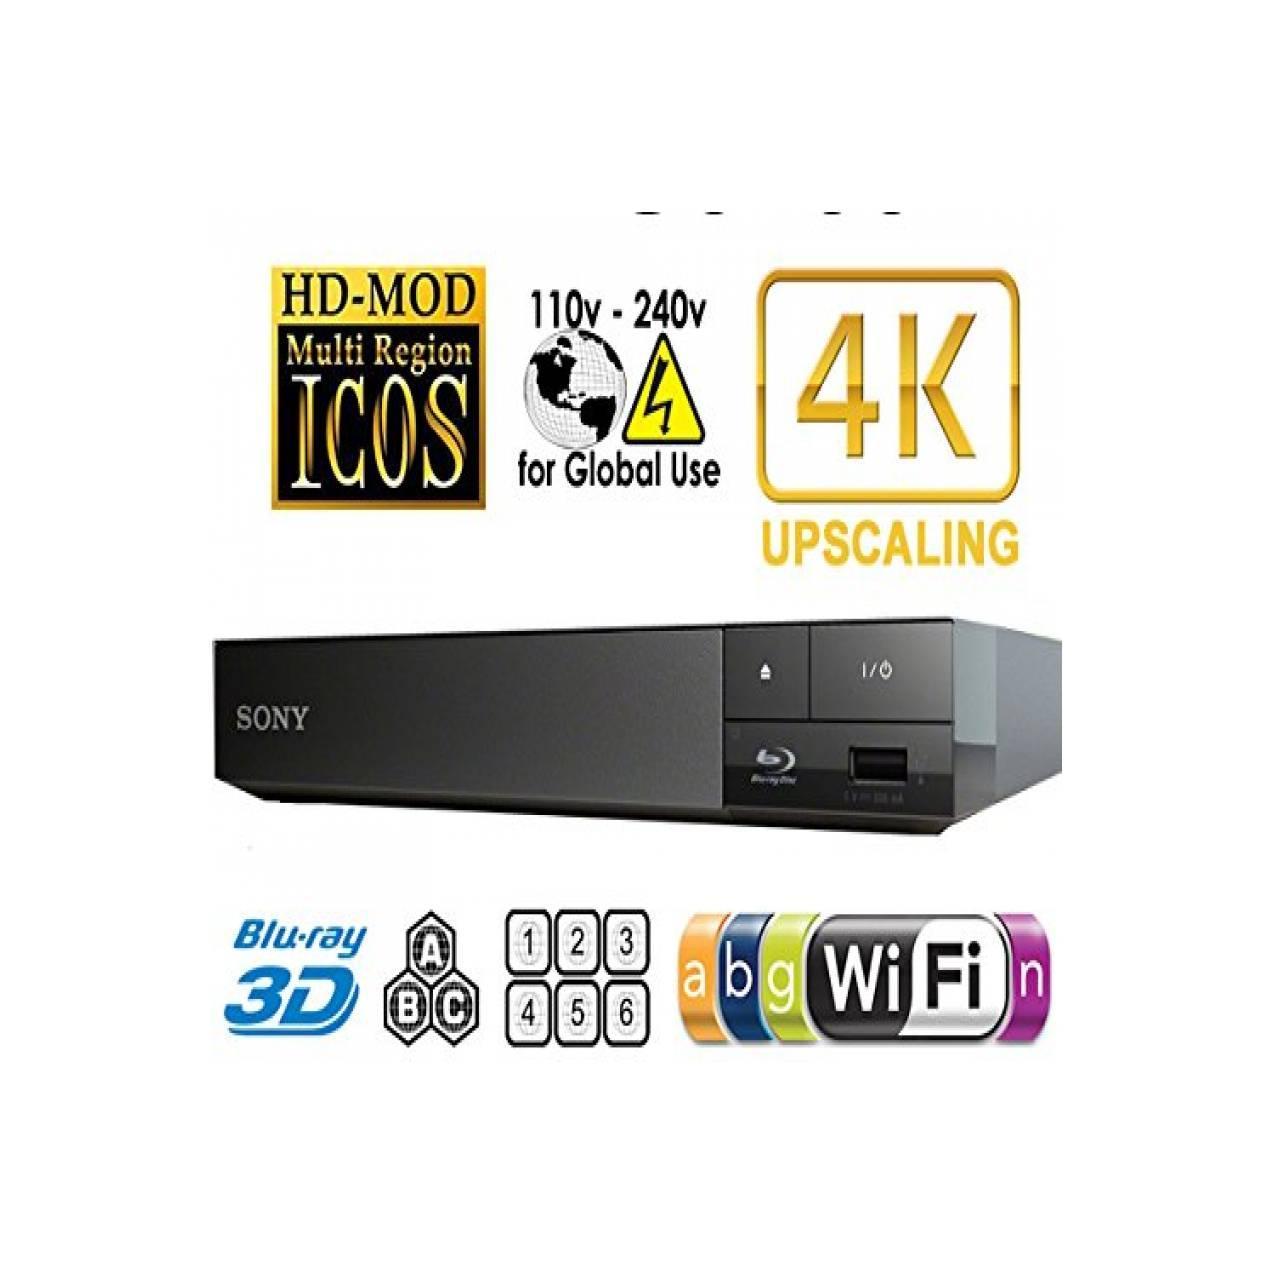 Rosanna Karpet Cendol Microfiber Kilap Chenille Glossy 150 X 200x150 Emas Bluray Player Sony Bdp S6700